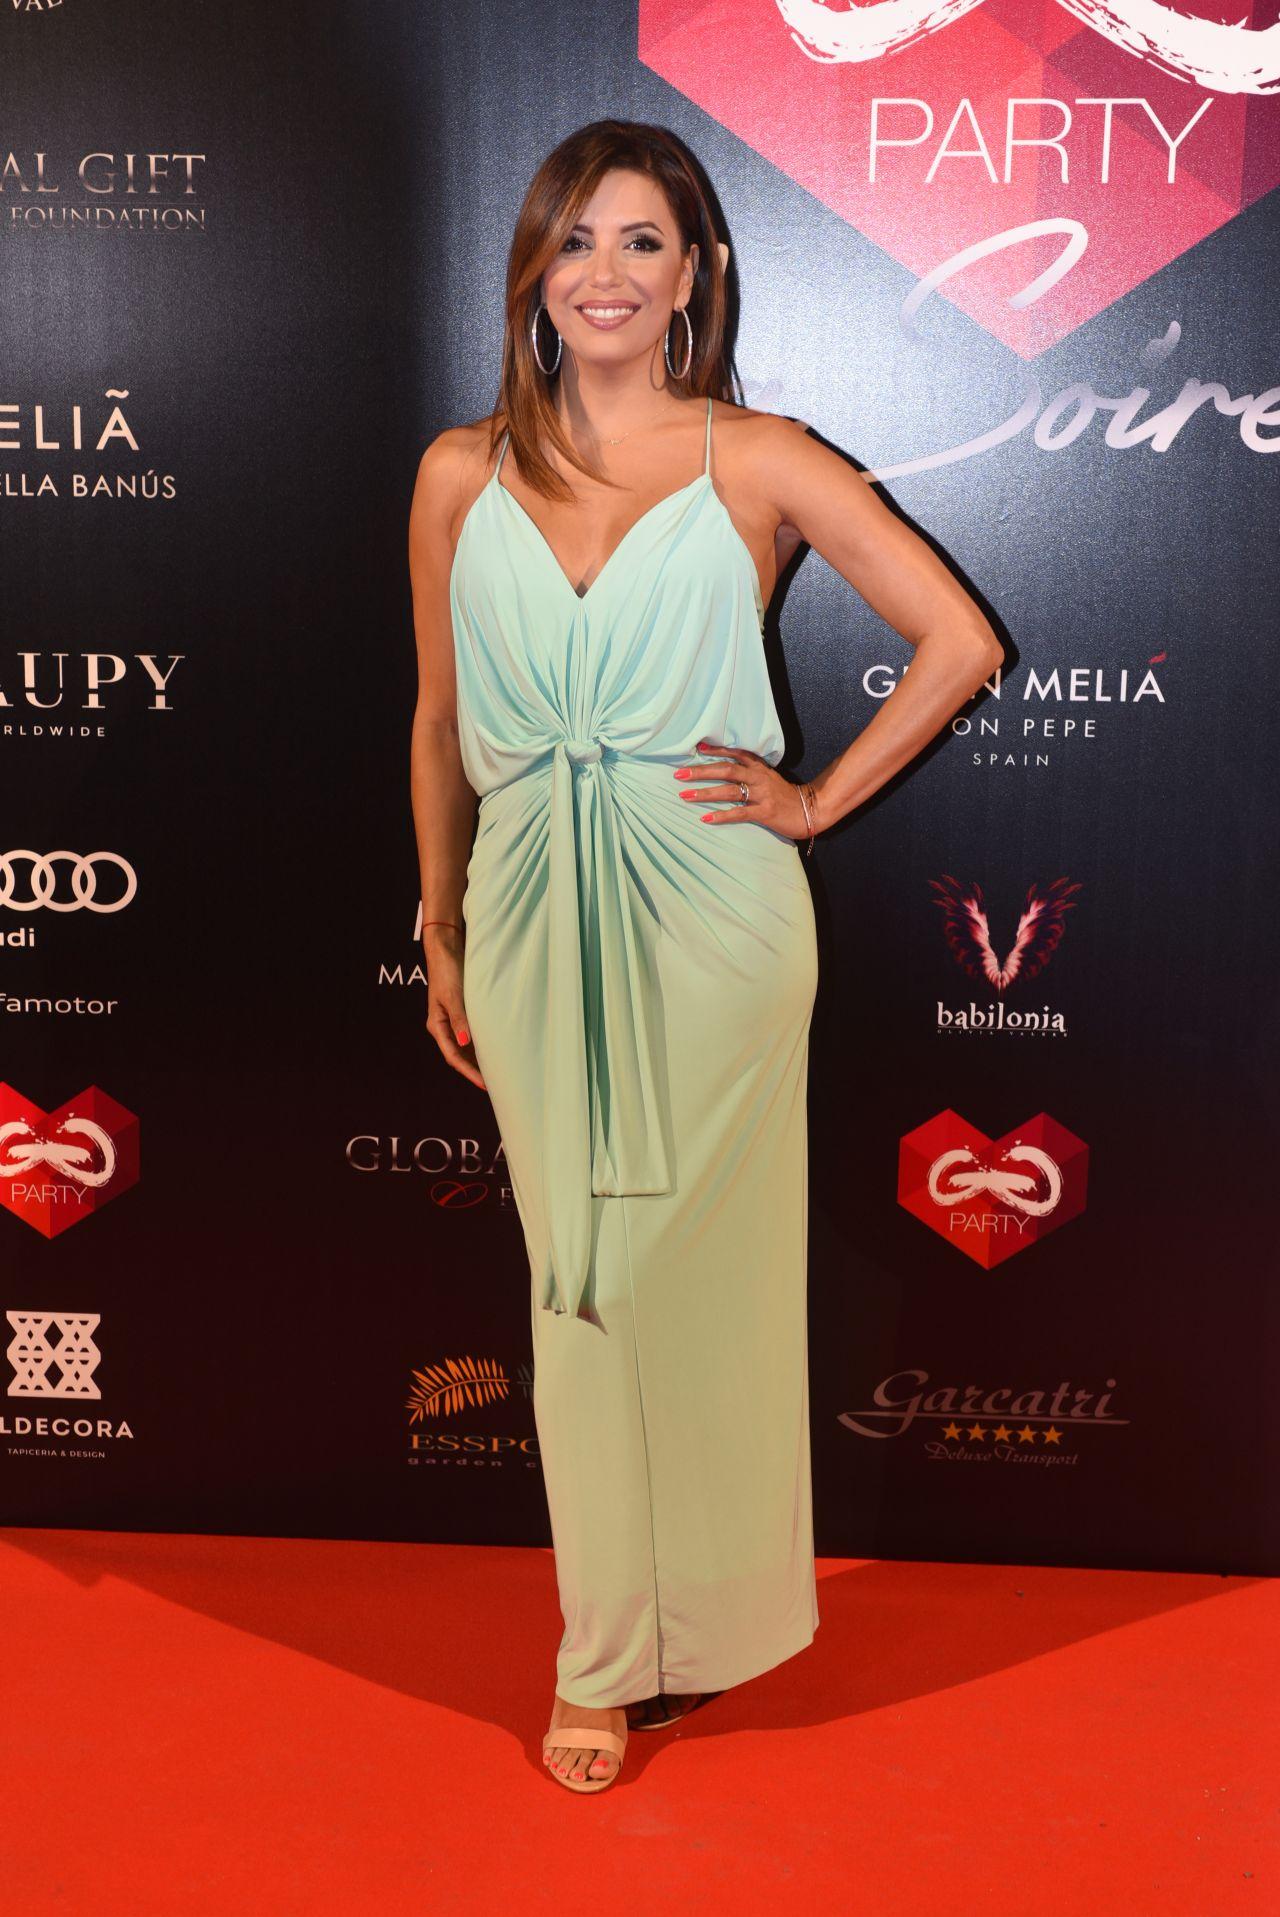 402fc16761a Eva Longoria - Global Gift Gala Pre-Party in Marbella